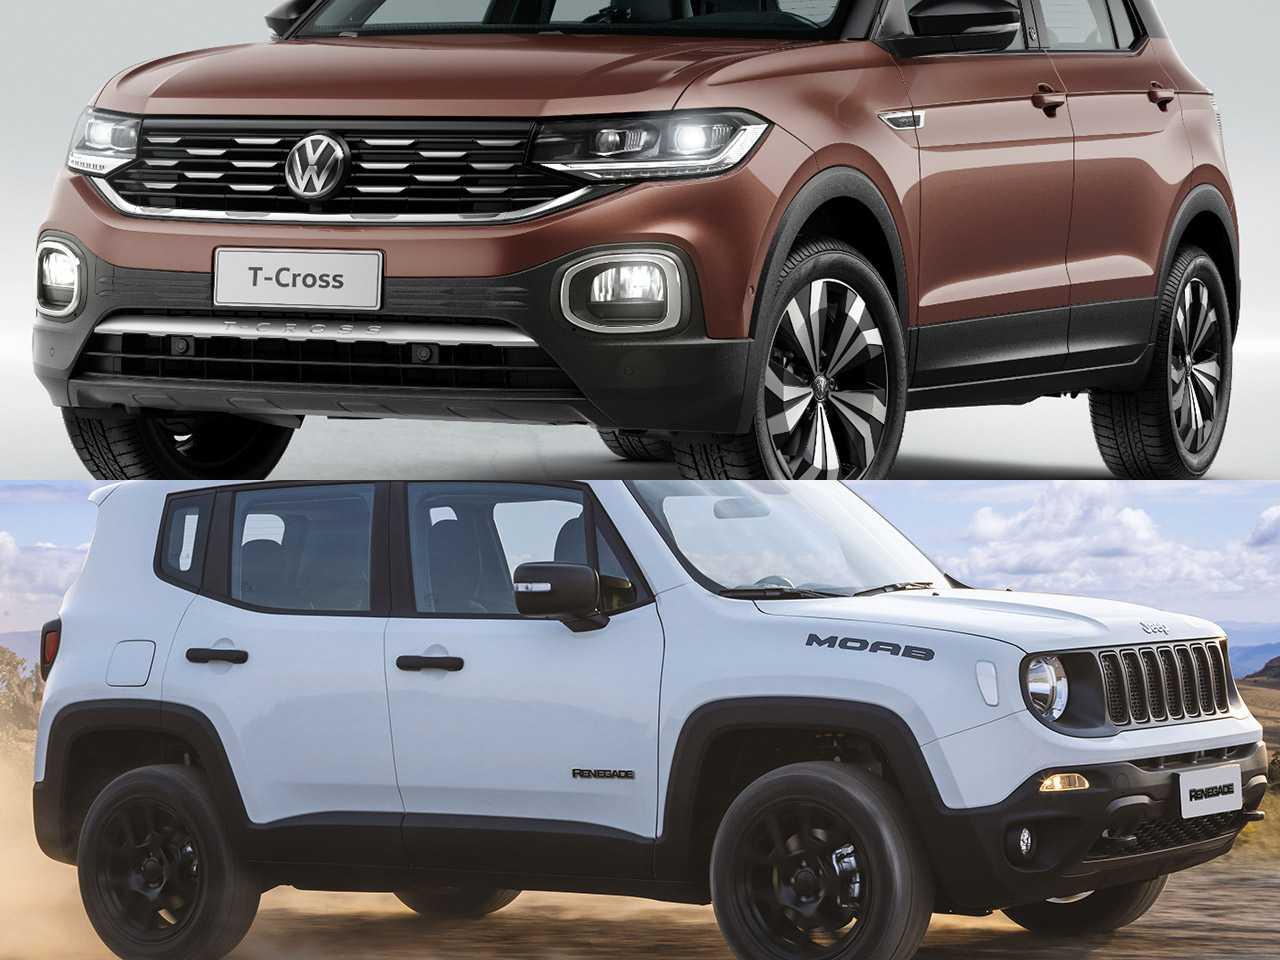 VW T-Cross e Jeep Renegade